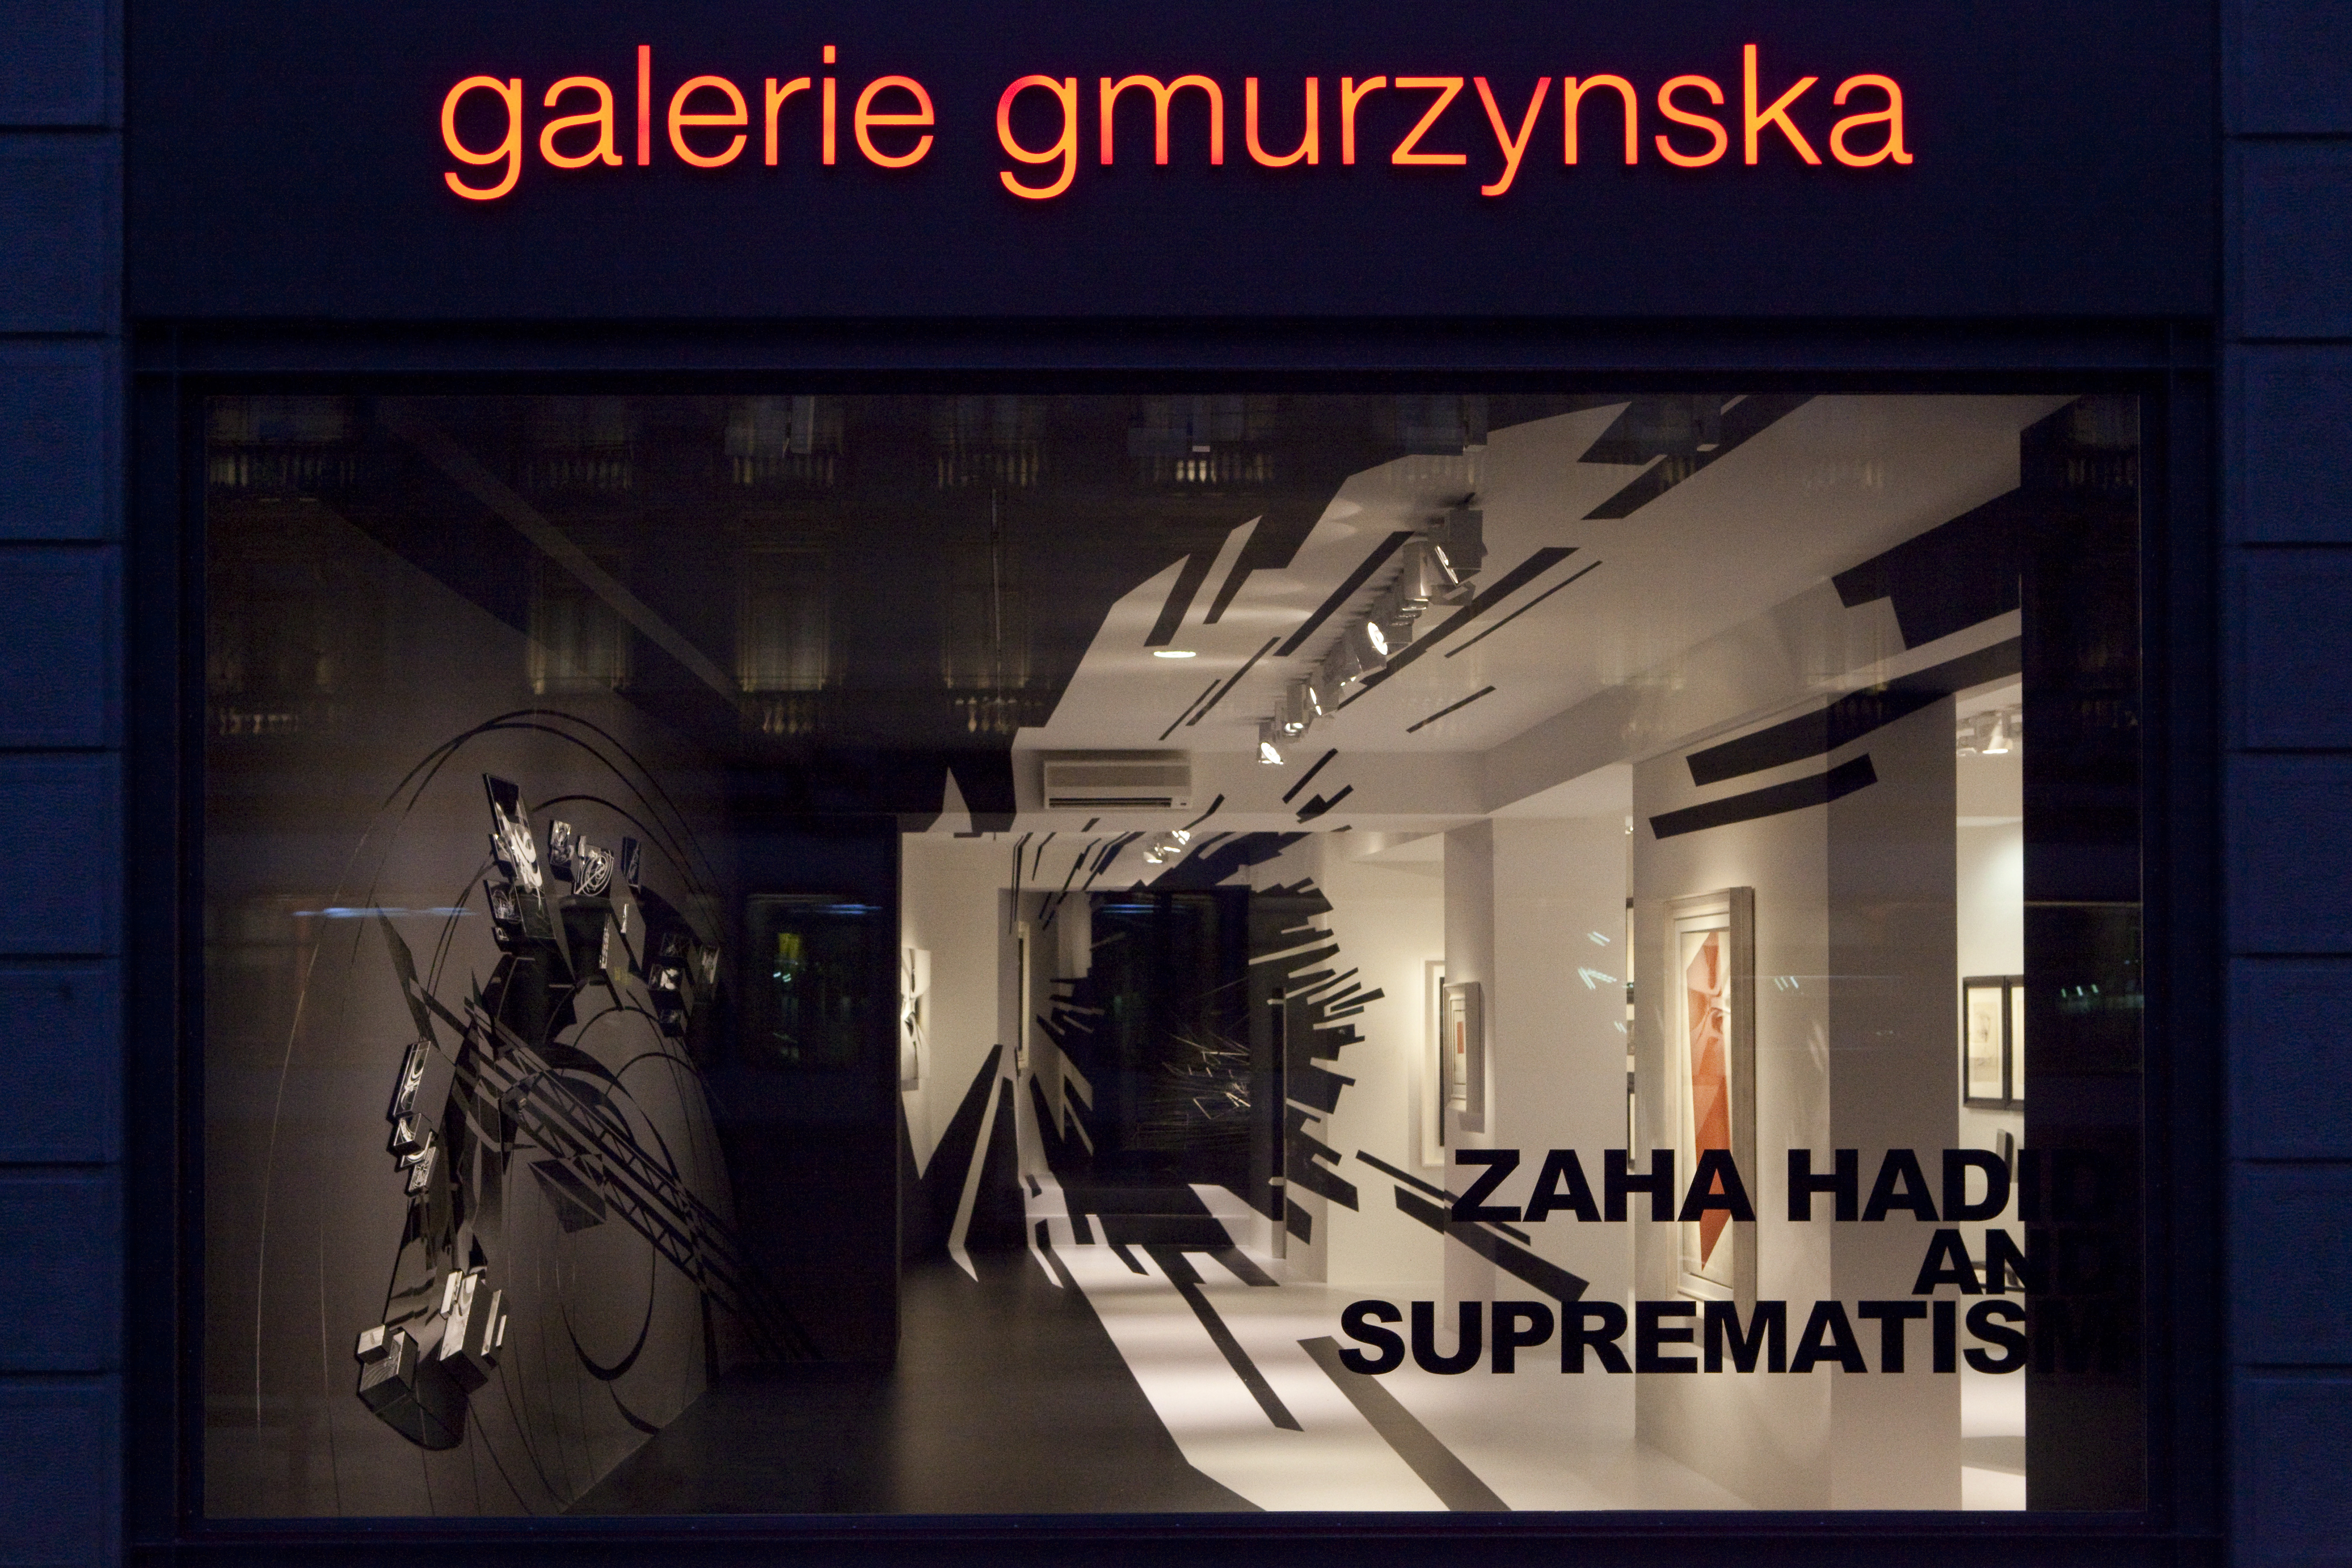 ZHA_Gmurzynska_01